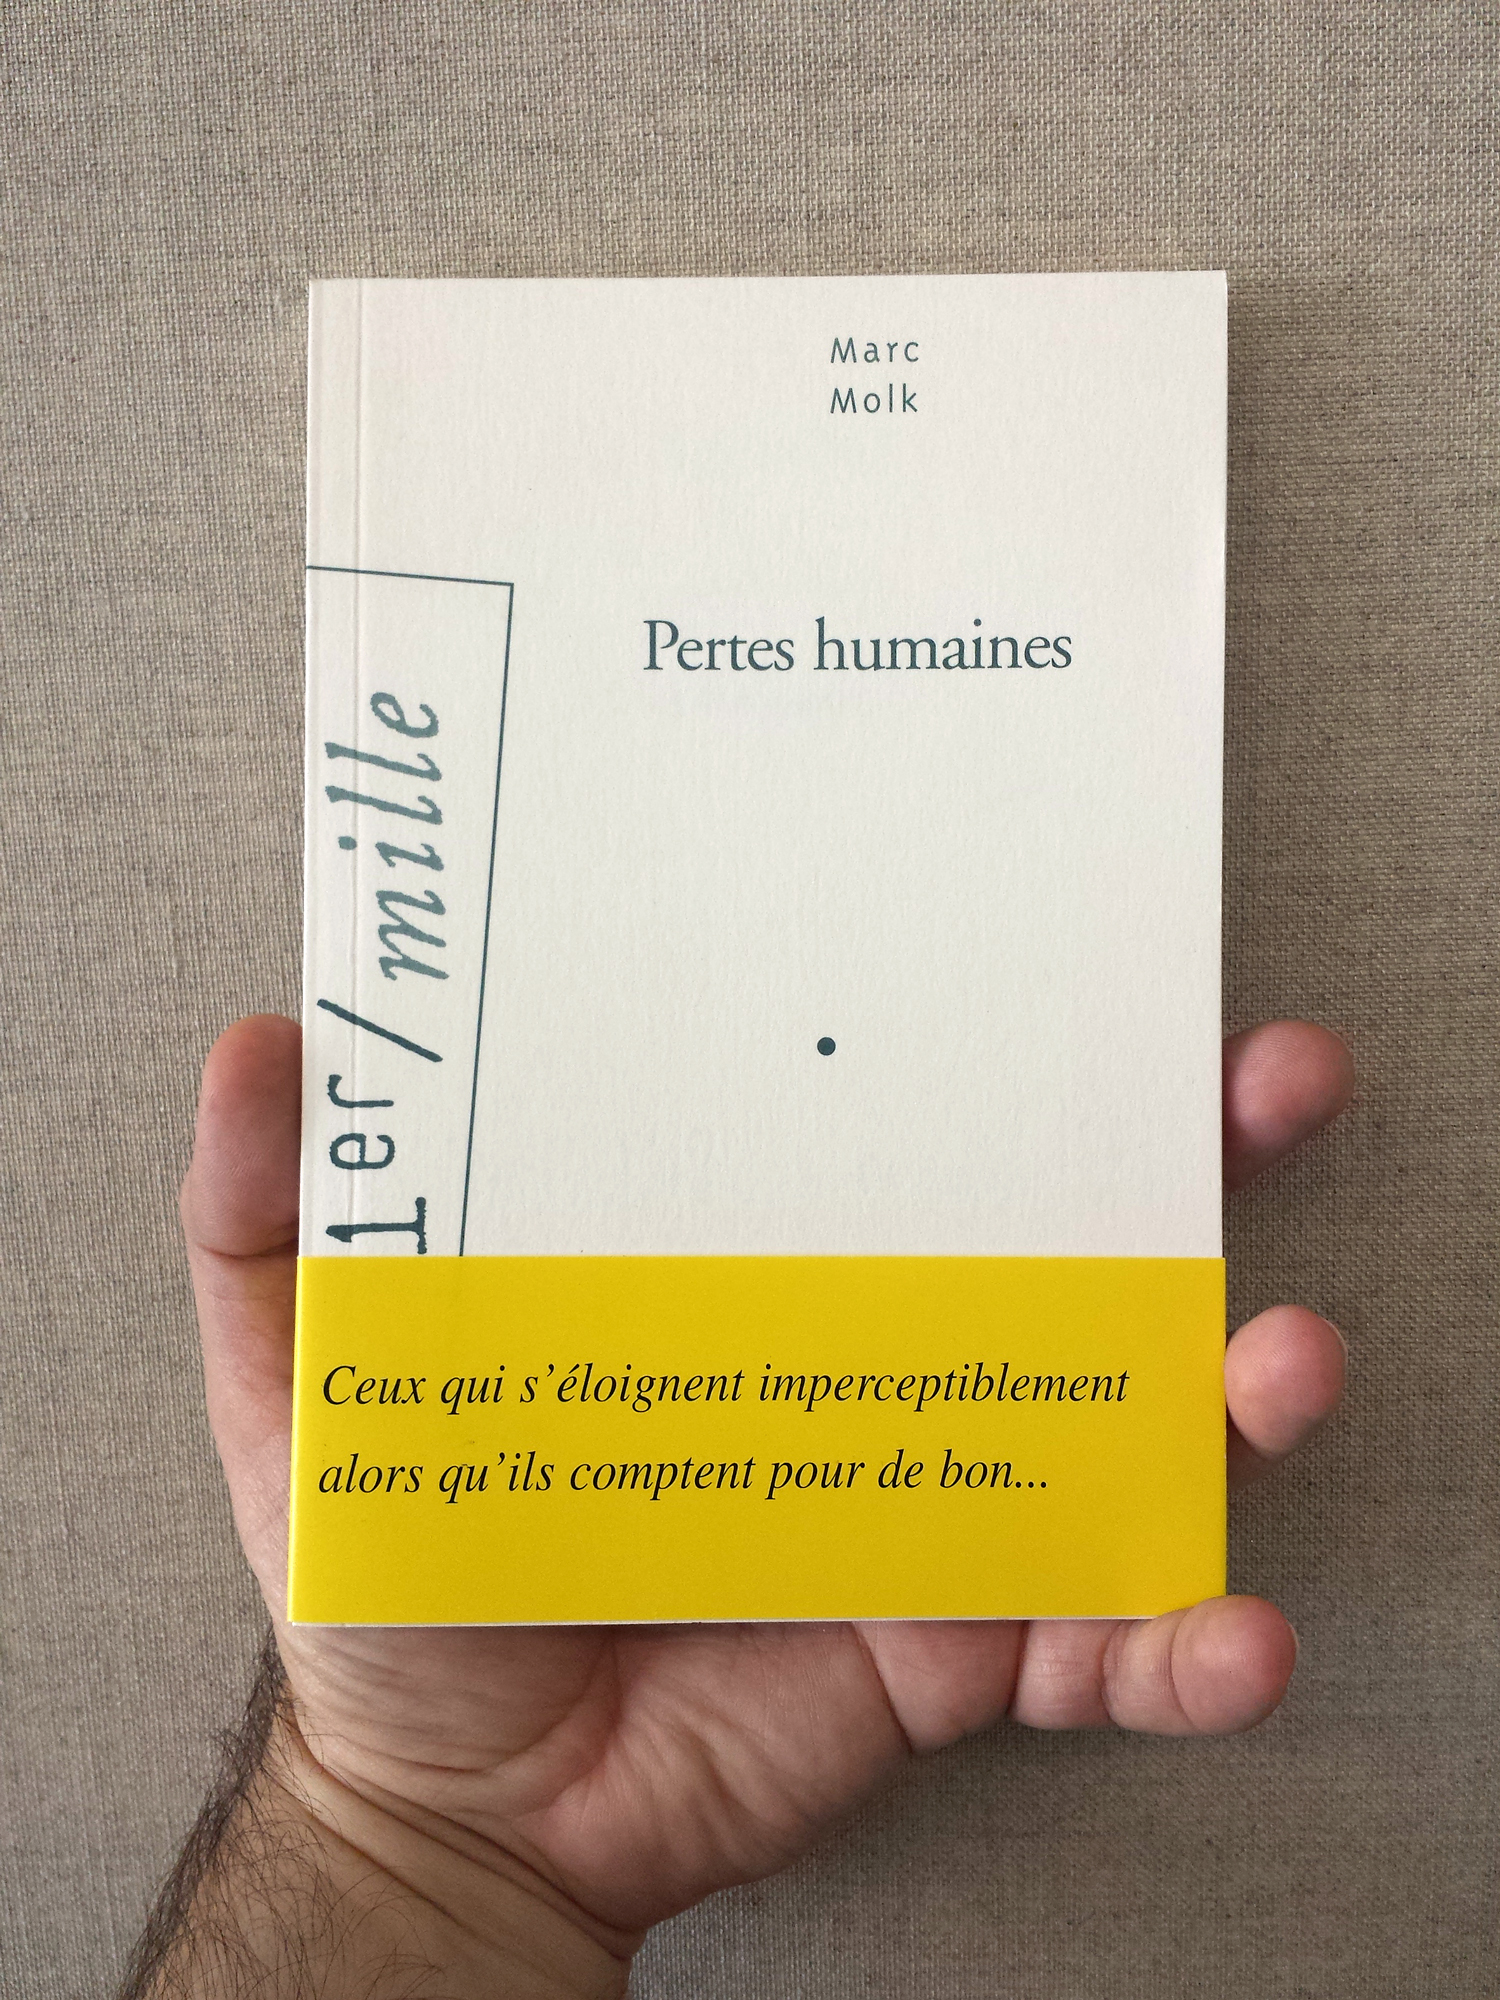 Human casualties, Marc Molk, Arléa editions, 2006